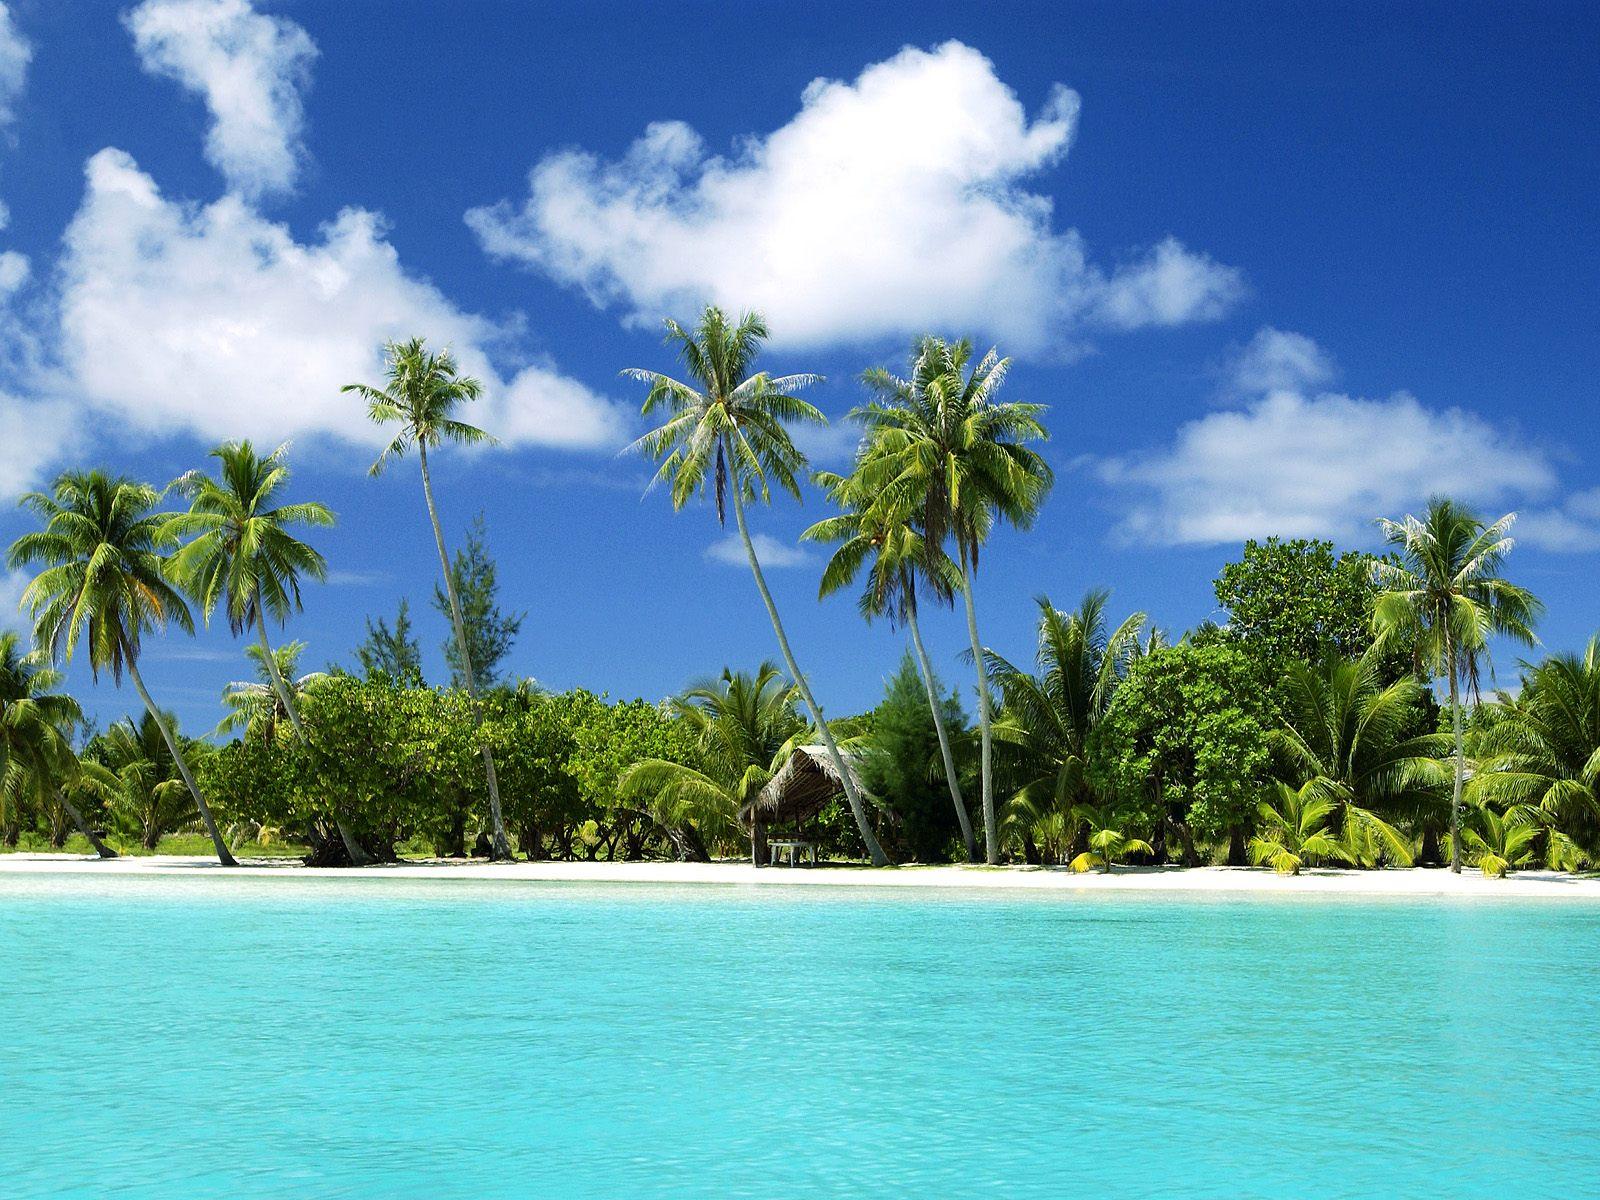 Tourism: Tropical Beaches